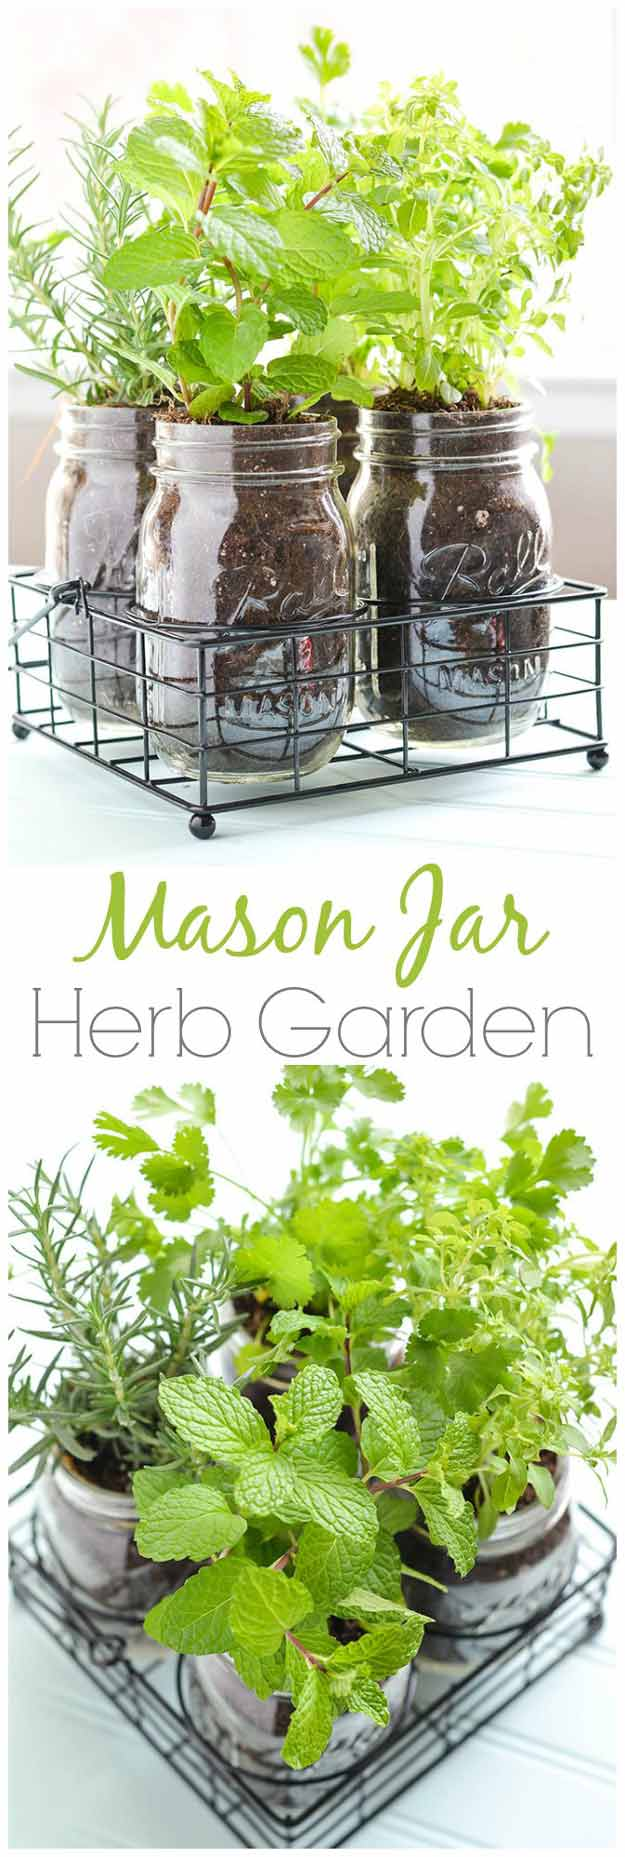 18 Indoor Herb Garden Ideas - Page 3 of 3